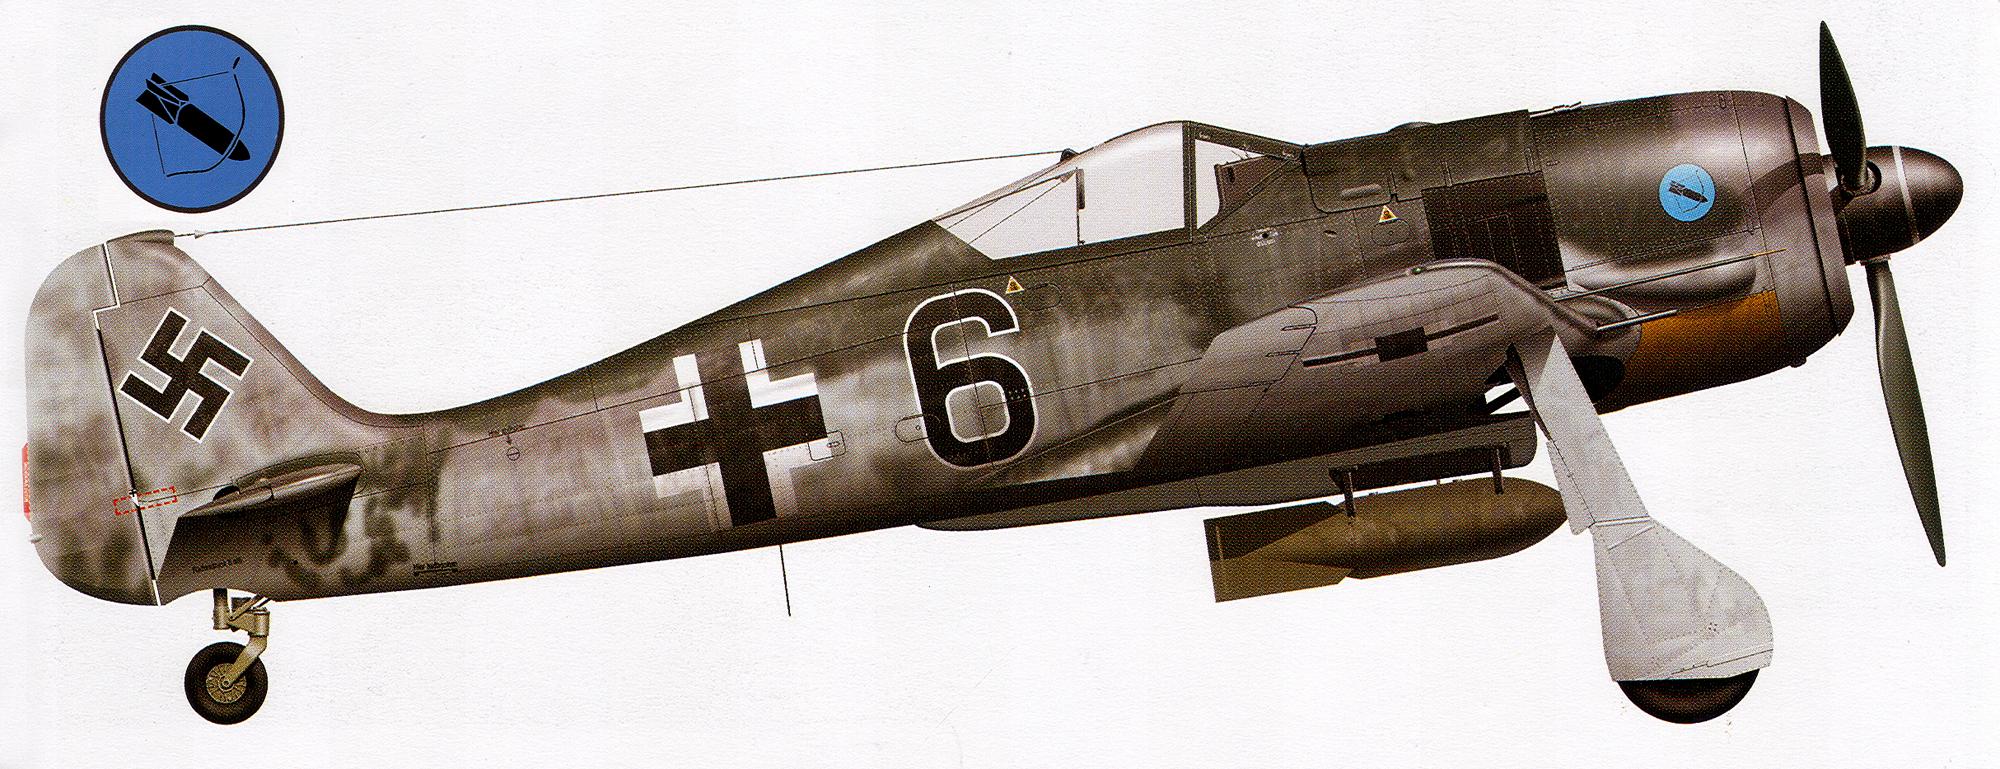 Focke Wulf Fw 190A 14.JG5 Black 6 Petsamo Finland 1943 0A